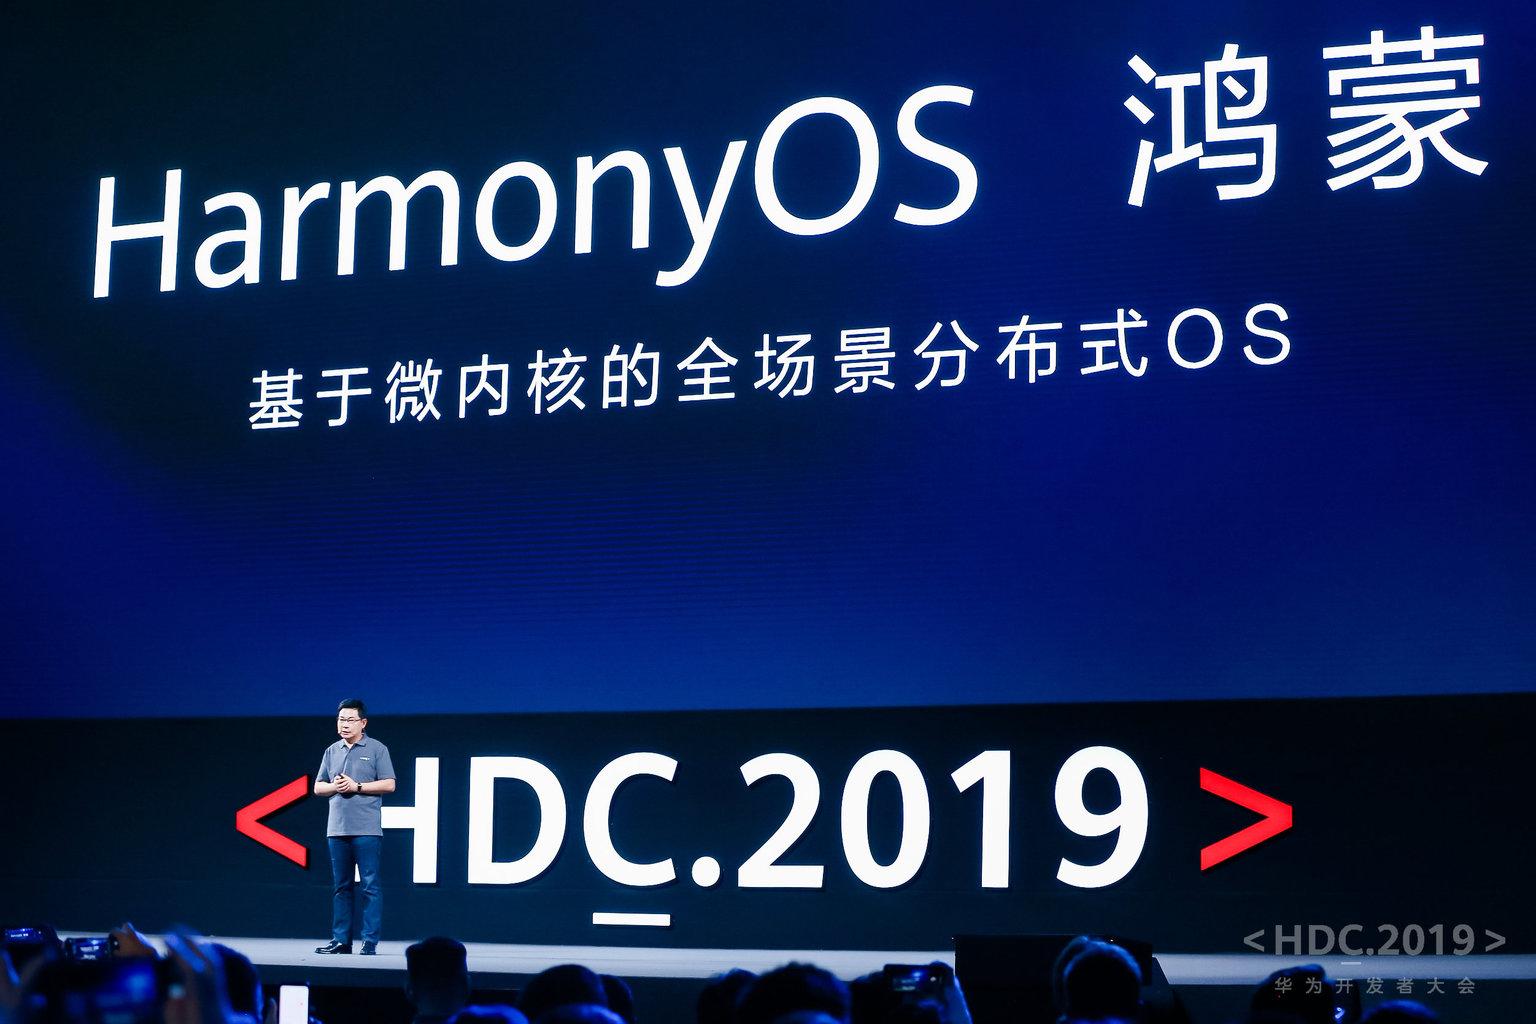 Harmony OS, cosa sappiamo del nuovo sistema operativo Huawei   The ...